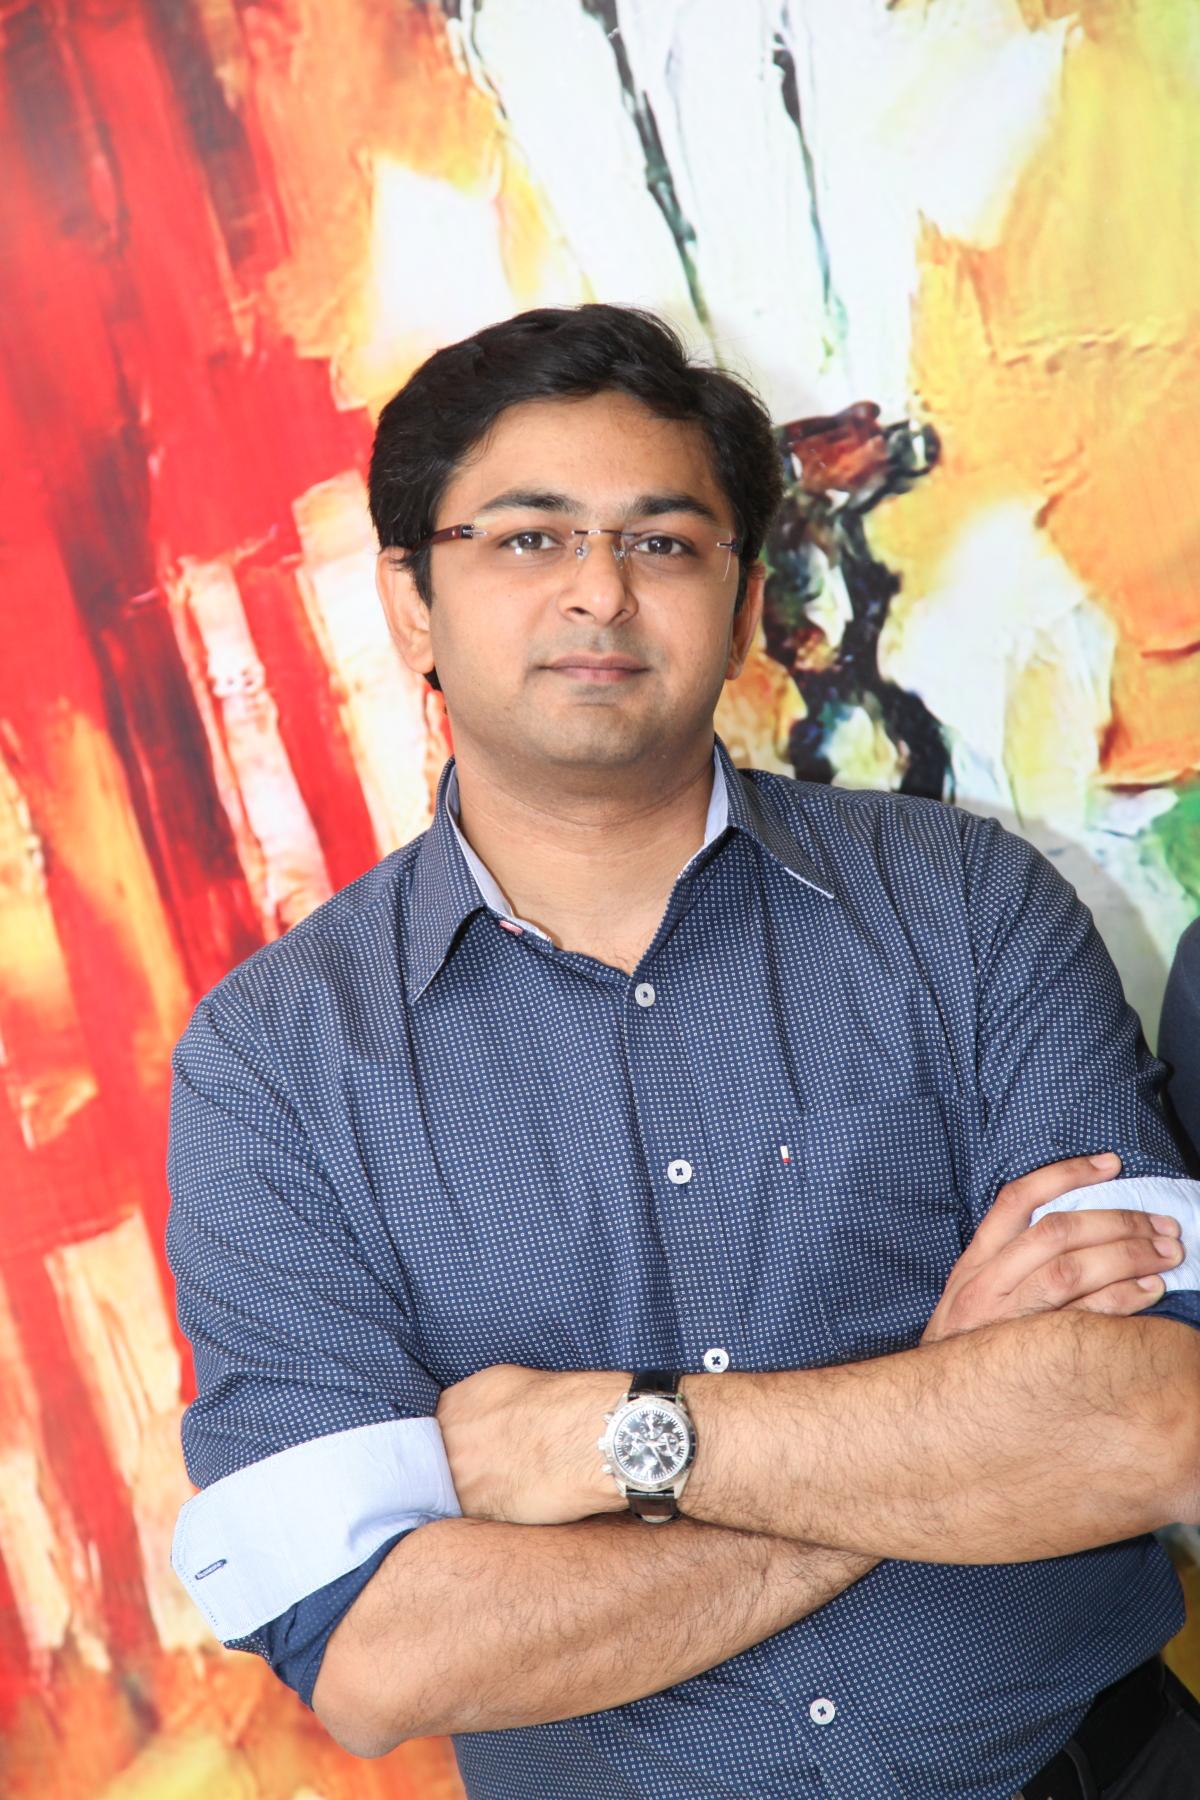 Abhijit Junagade, co-founder, Winjit Technologies